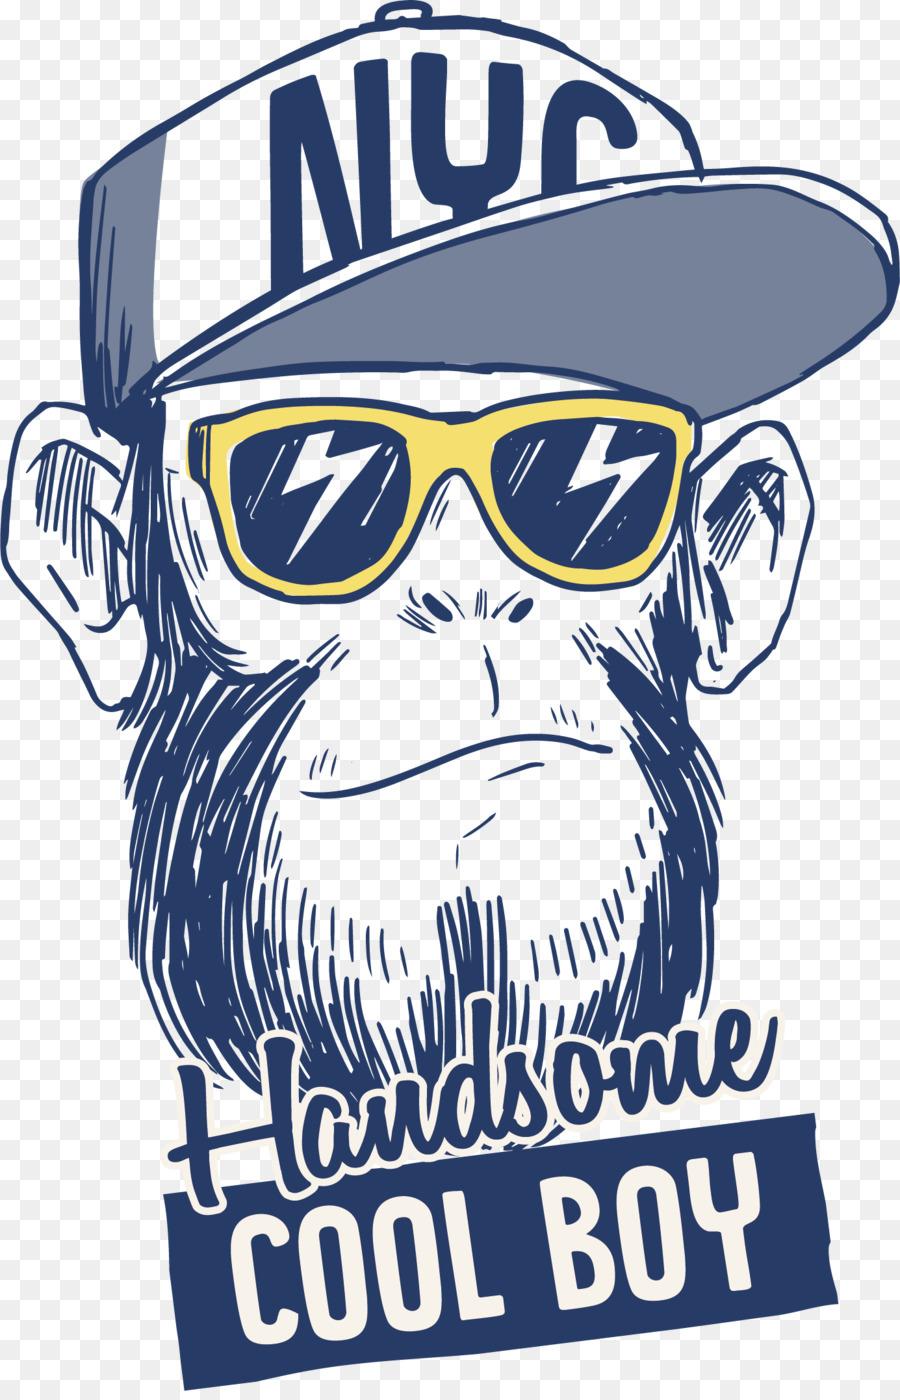 Descarga gratuita de Camiseta, Gorila, Logotipo Imágen de Png